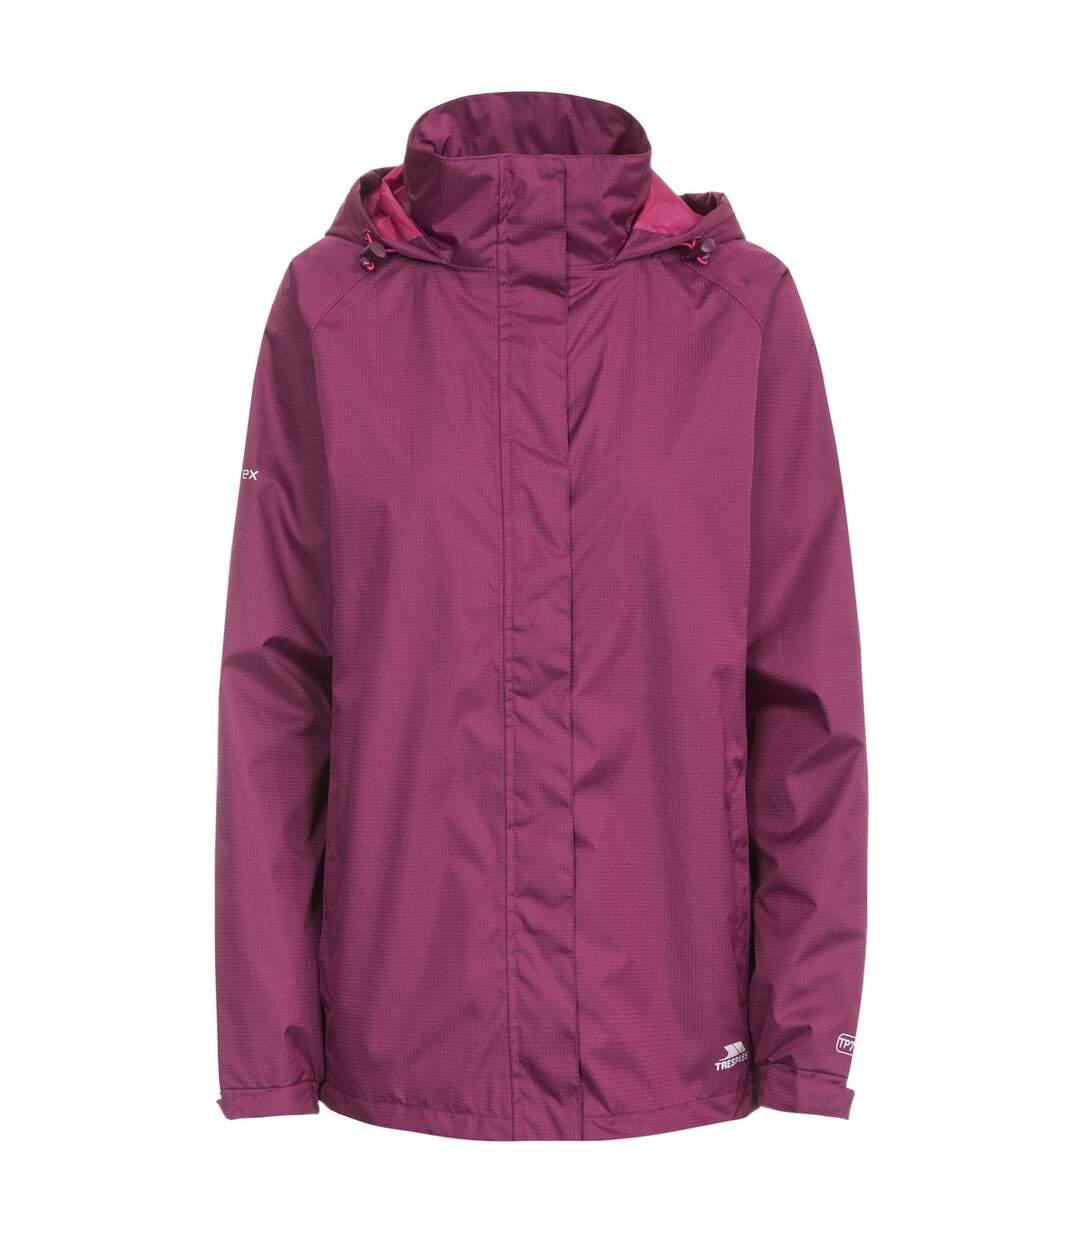 Trespass Womens/Ladies Lanna II Waterproof Jacket (Grape Wine) - UTTP3279